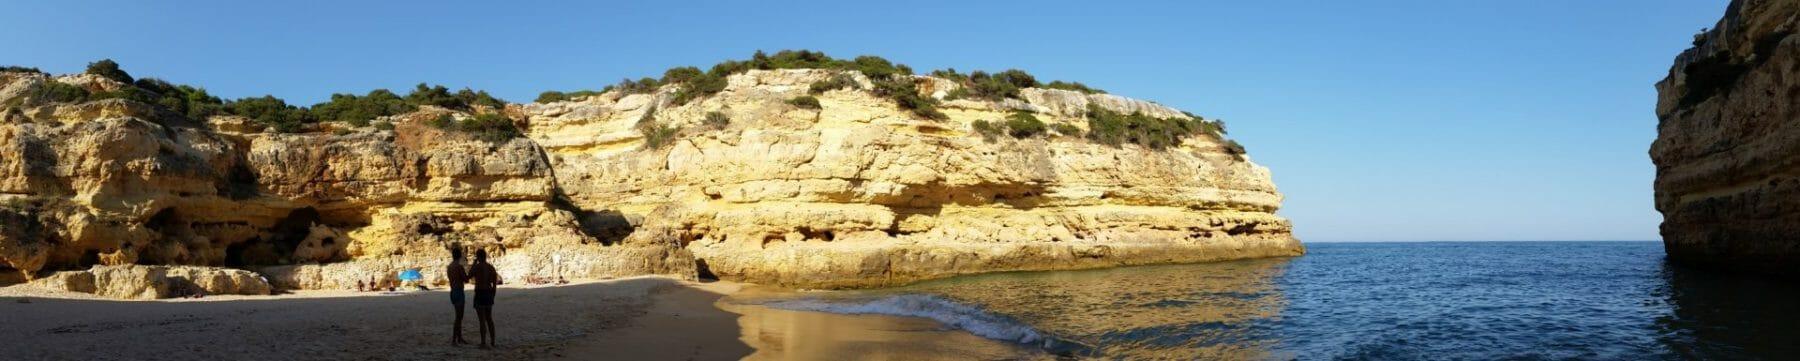 Yoga Retreat - Versteckte Sandbucht Felsenalgarve